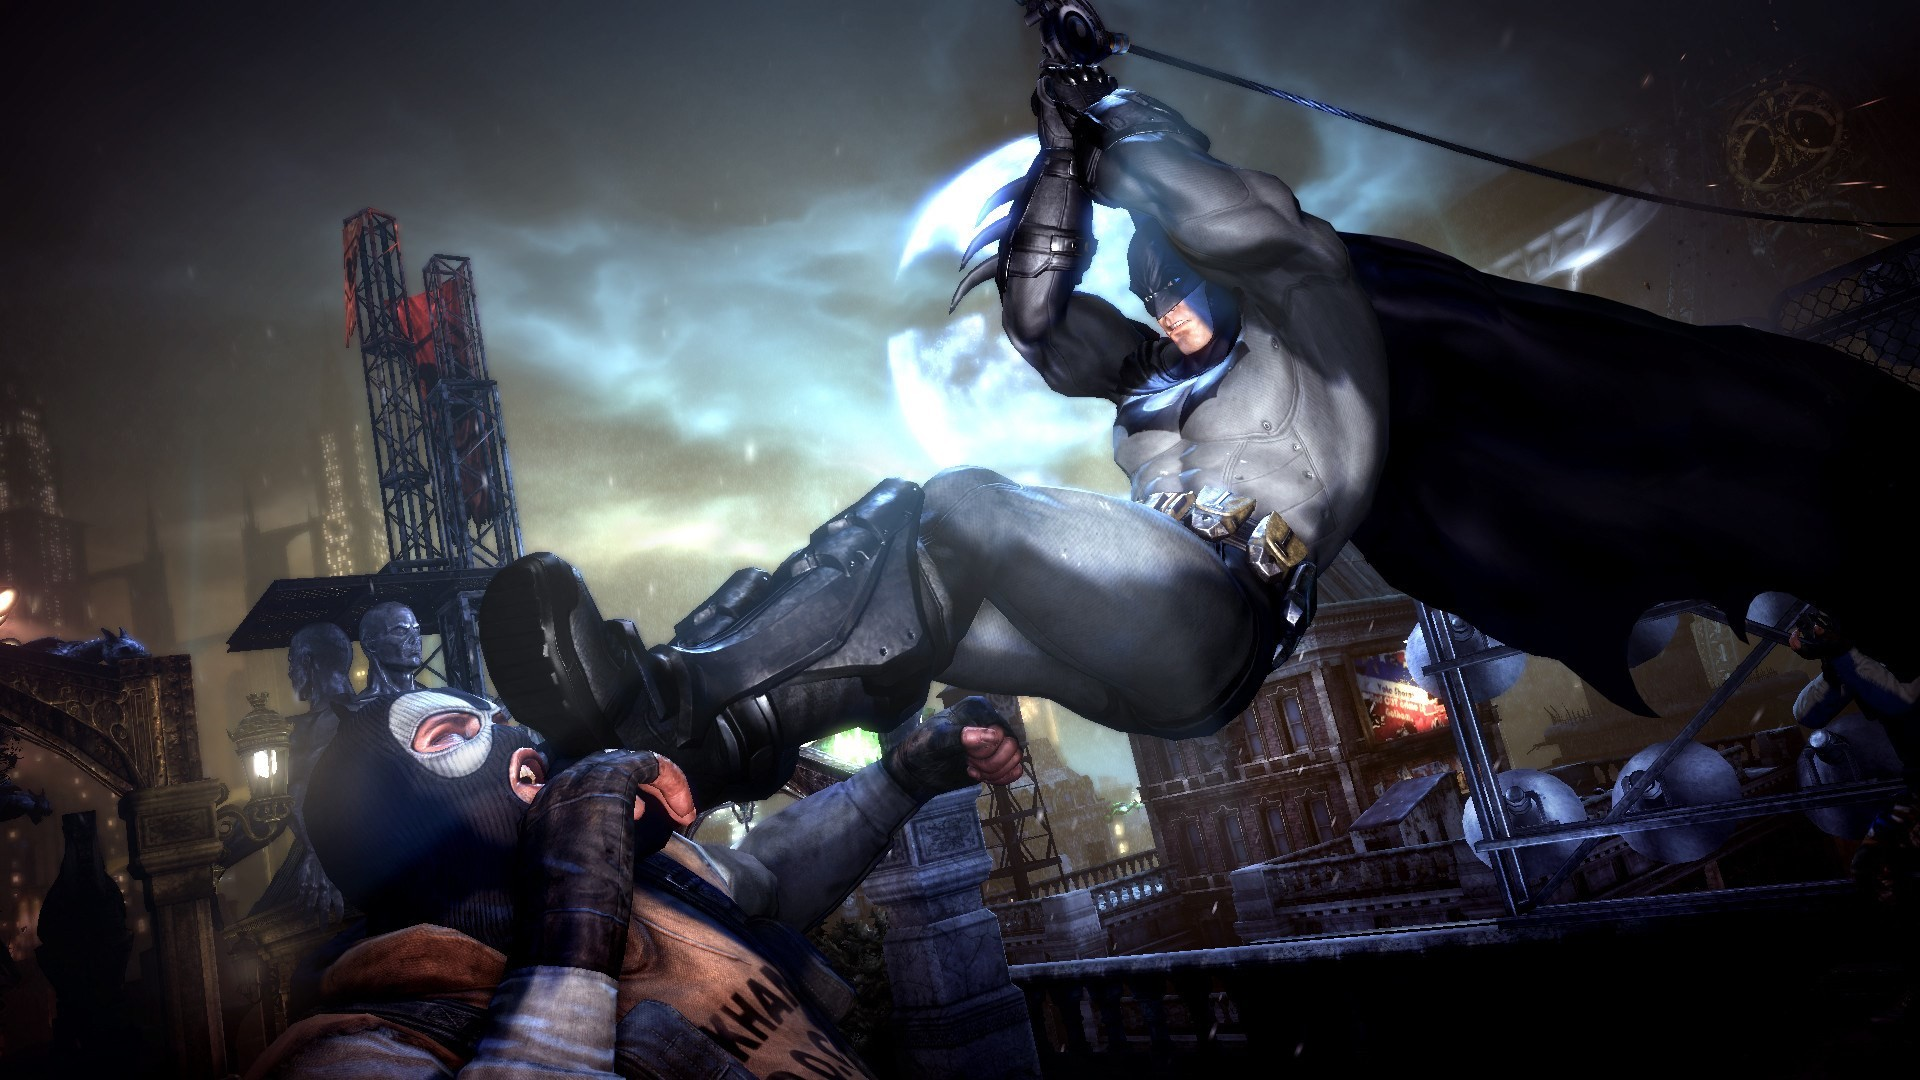 HQ Definition Wallpaper Desktop batman return to arkham